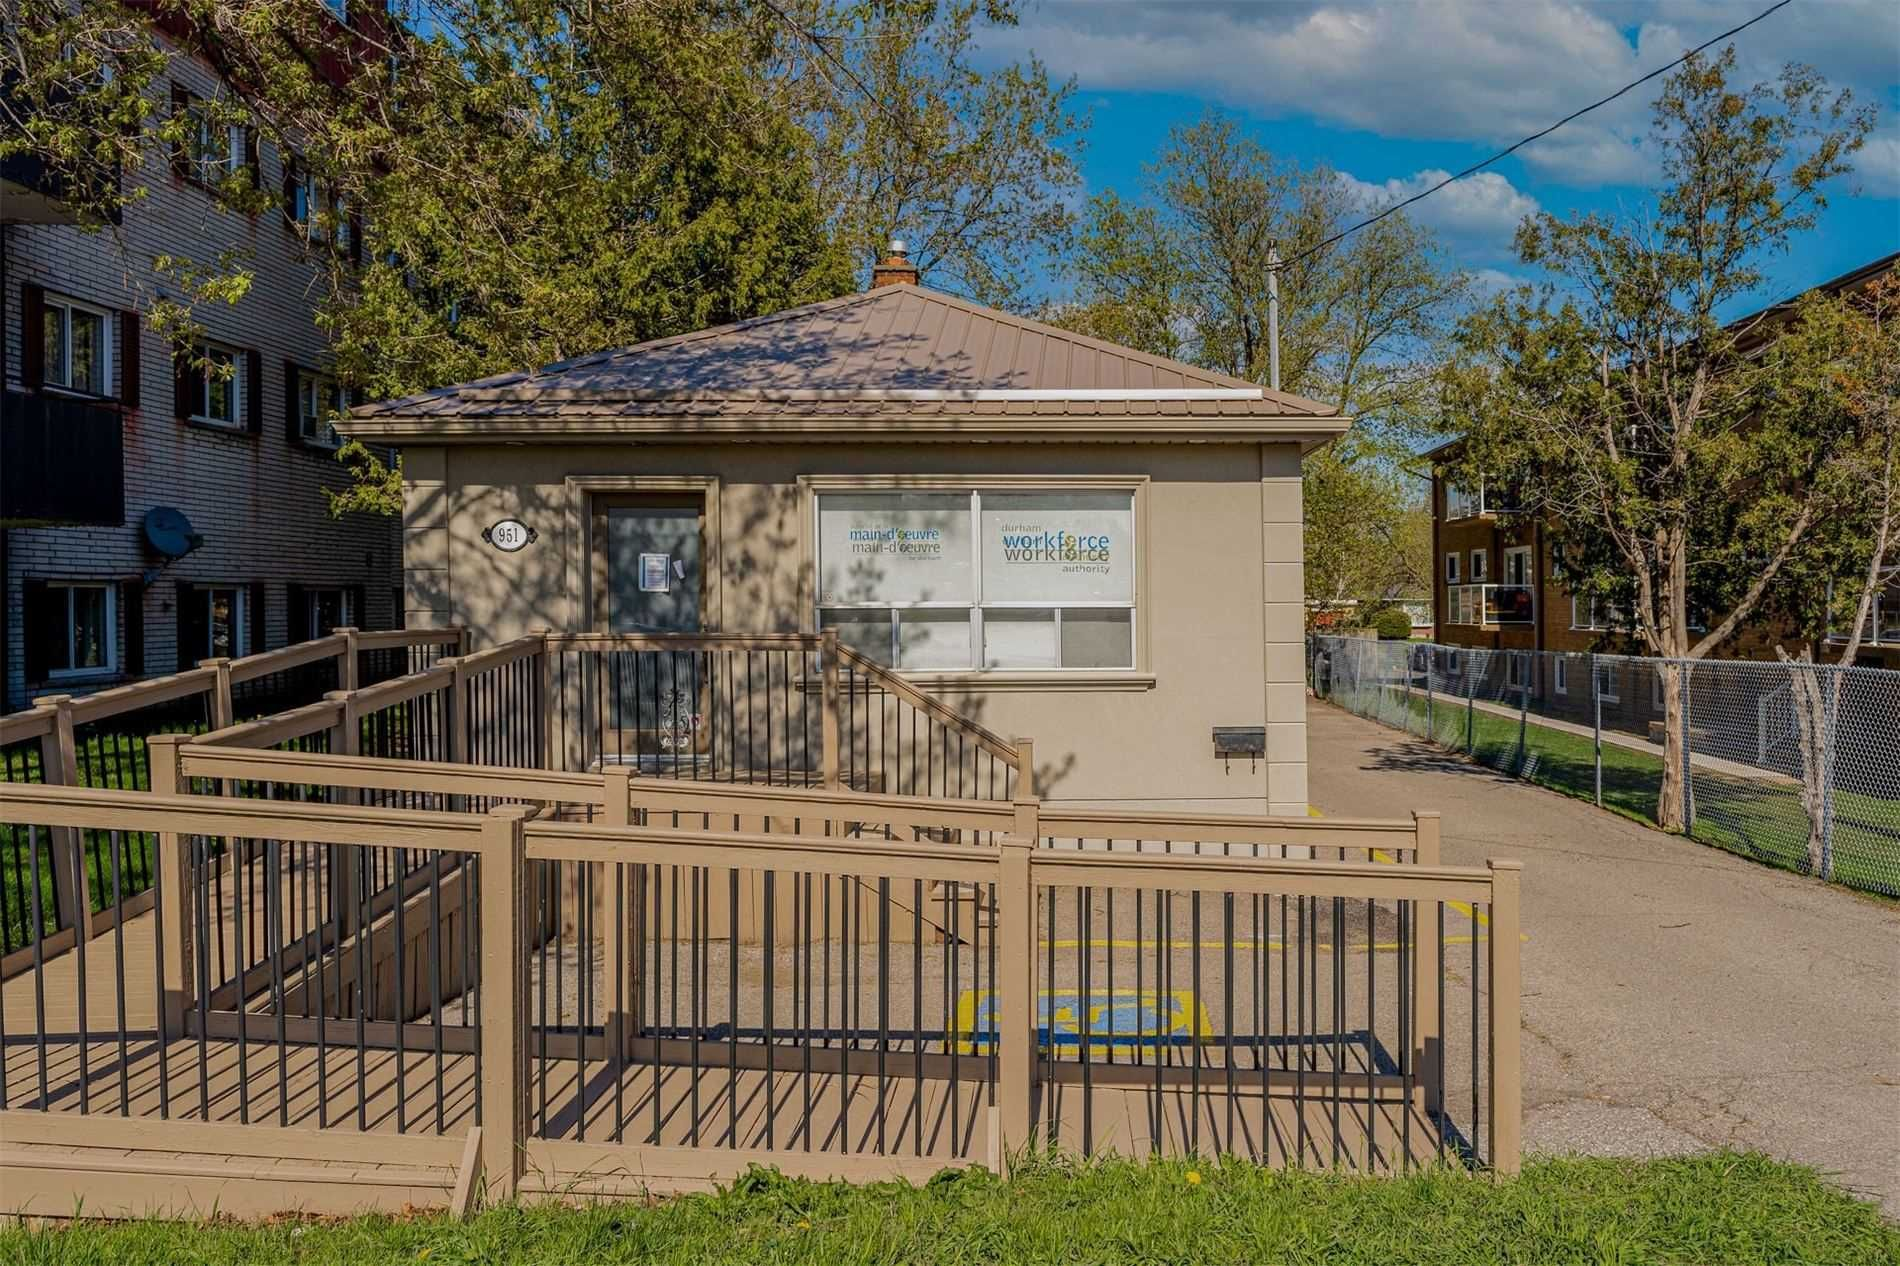 Main Photo: 951 N Simcoe Street in Oshawa: Centennial Property for sale : MLS®# E5232565